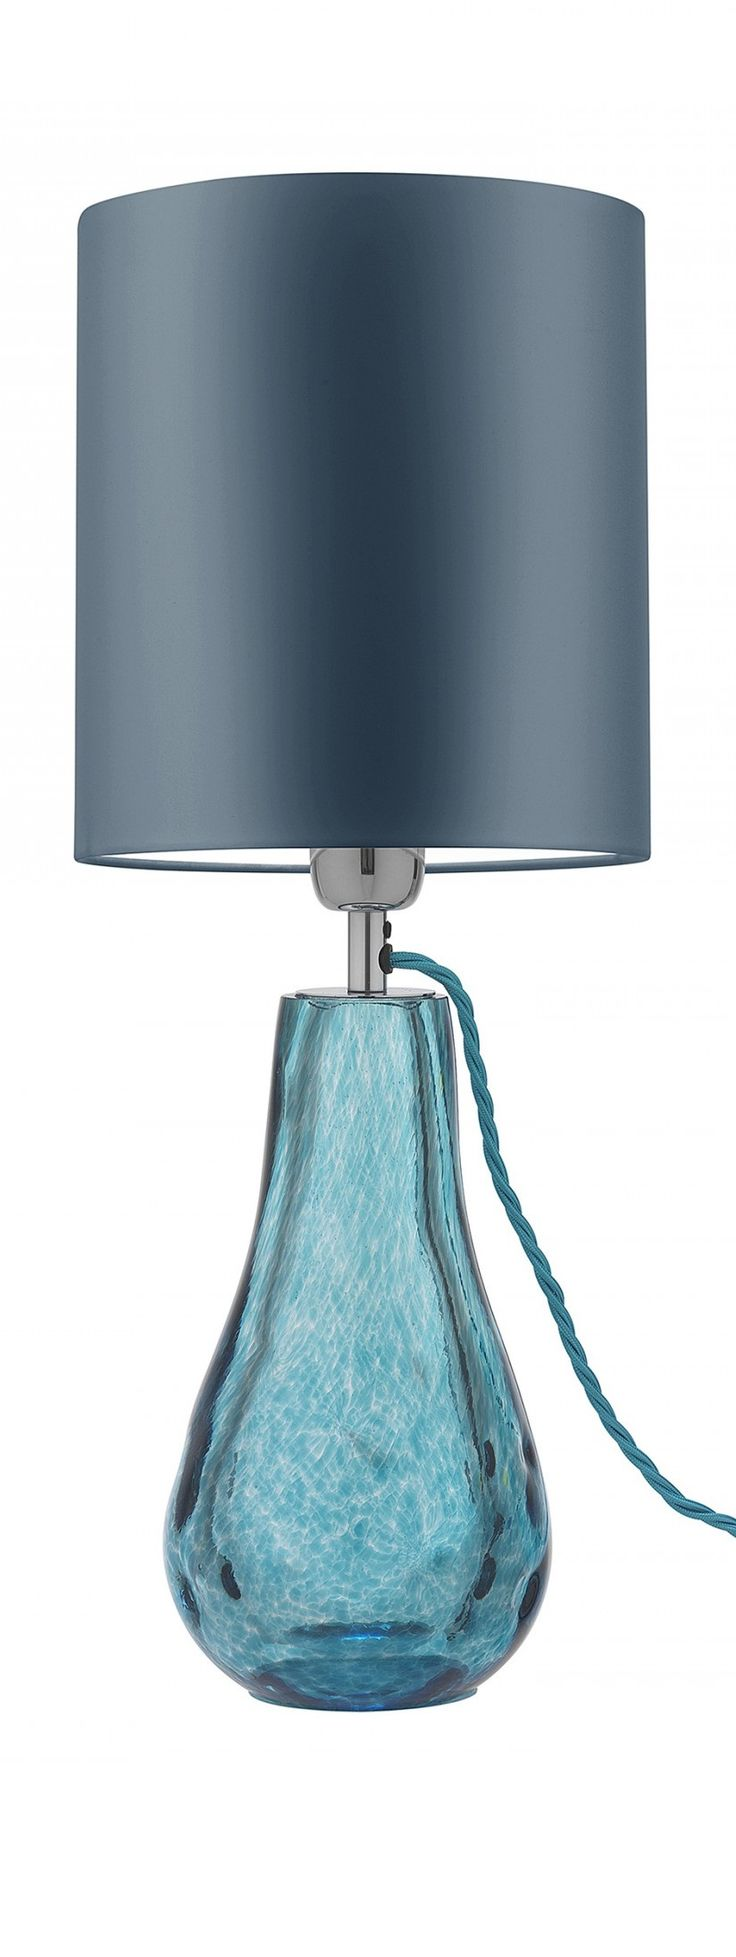 "Best 78 ""Blue Lamp"" ideas on Pinterest   Blue lamps, Blue ..."